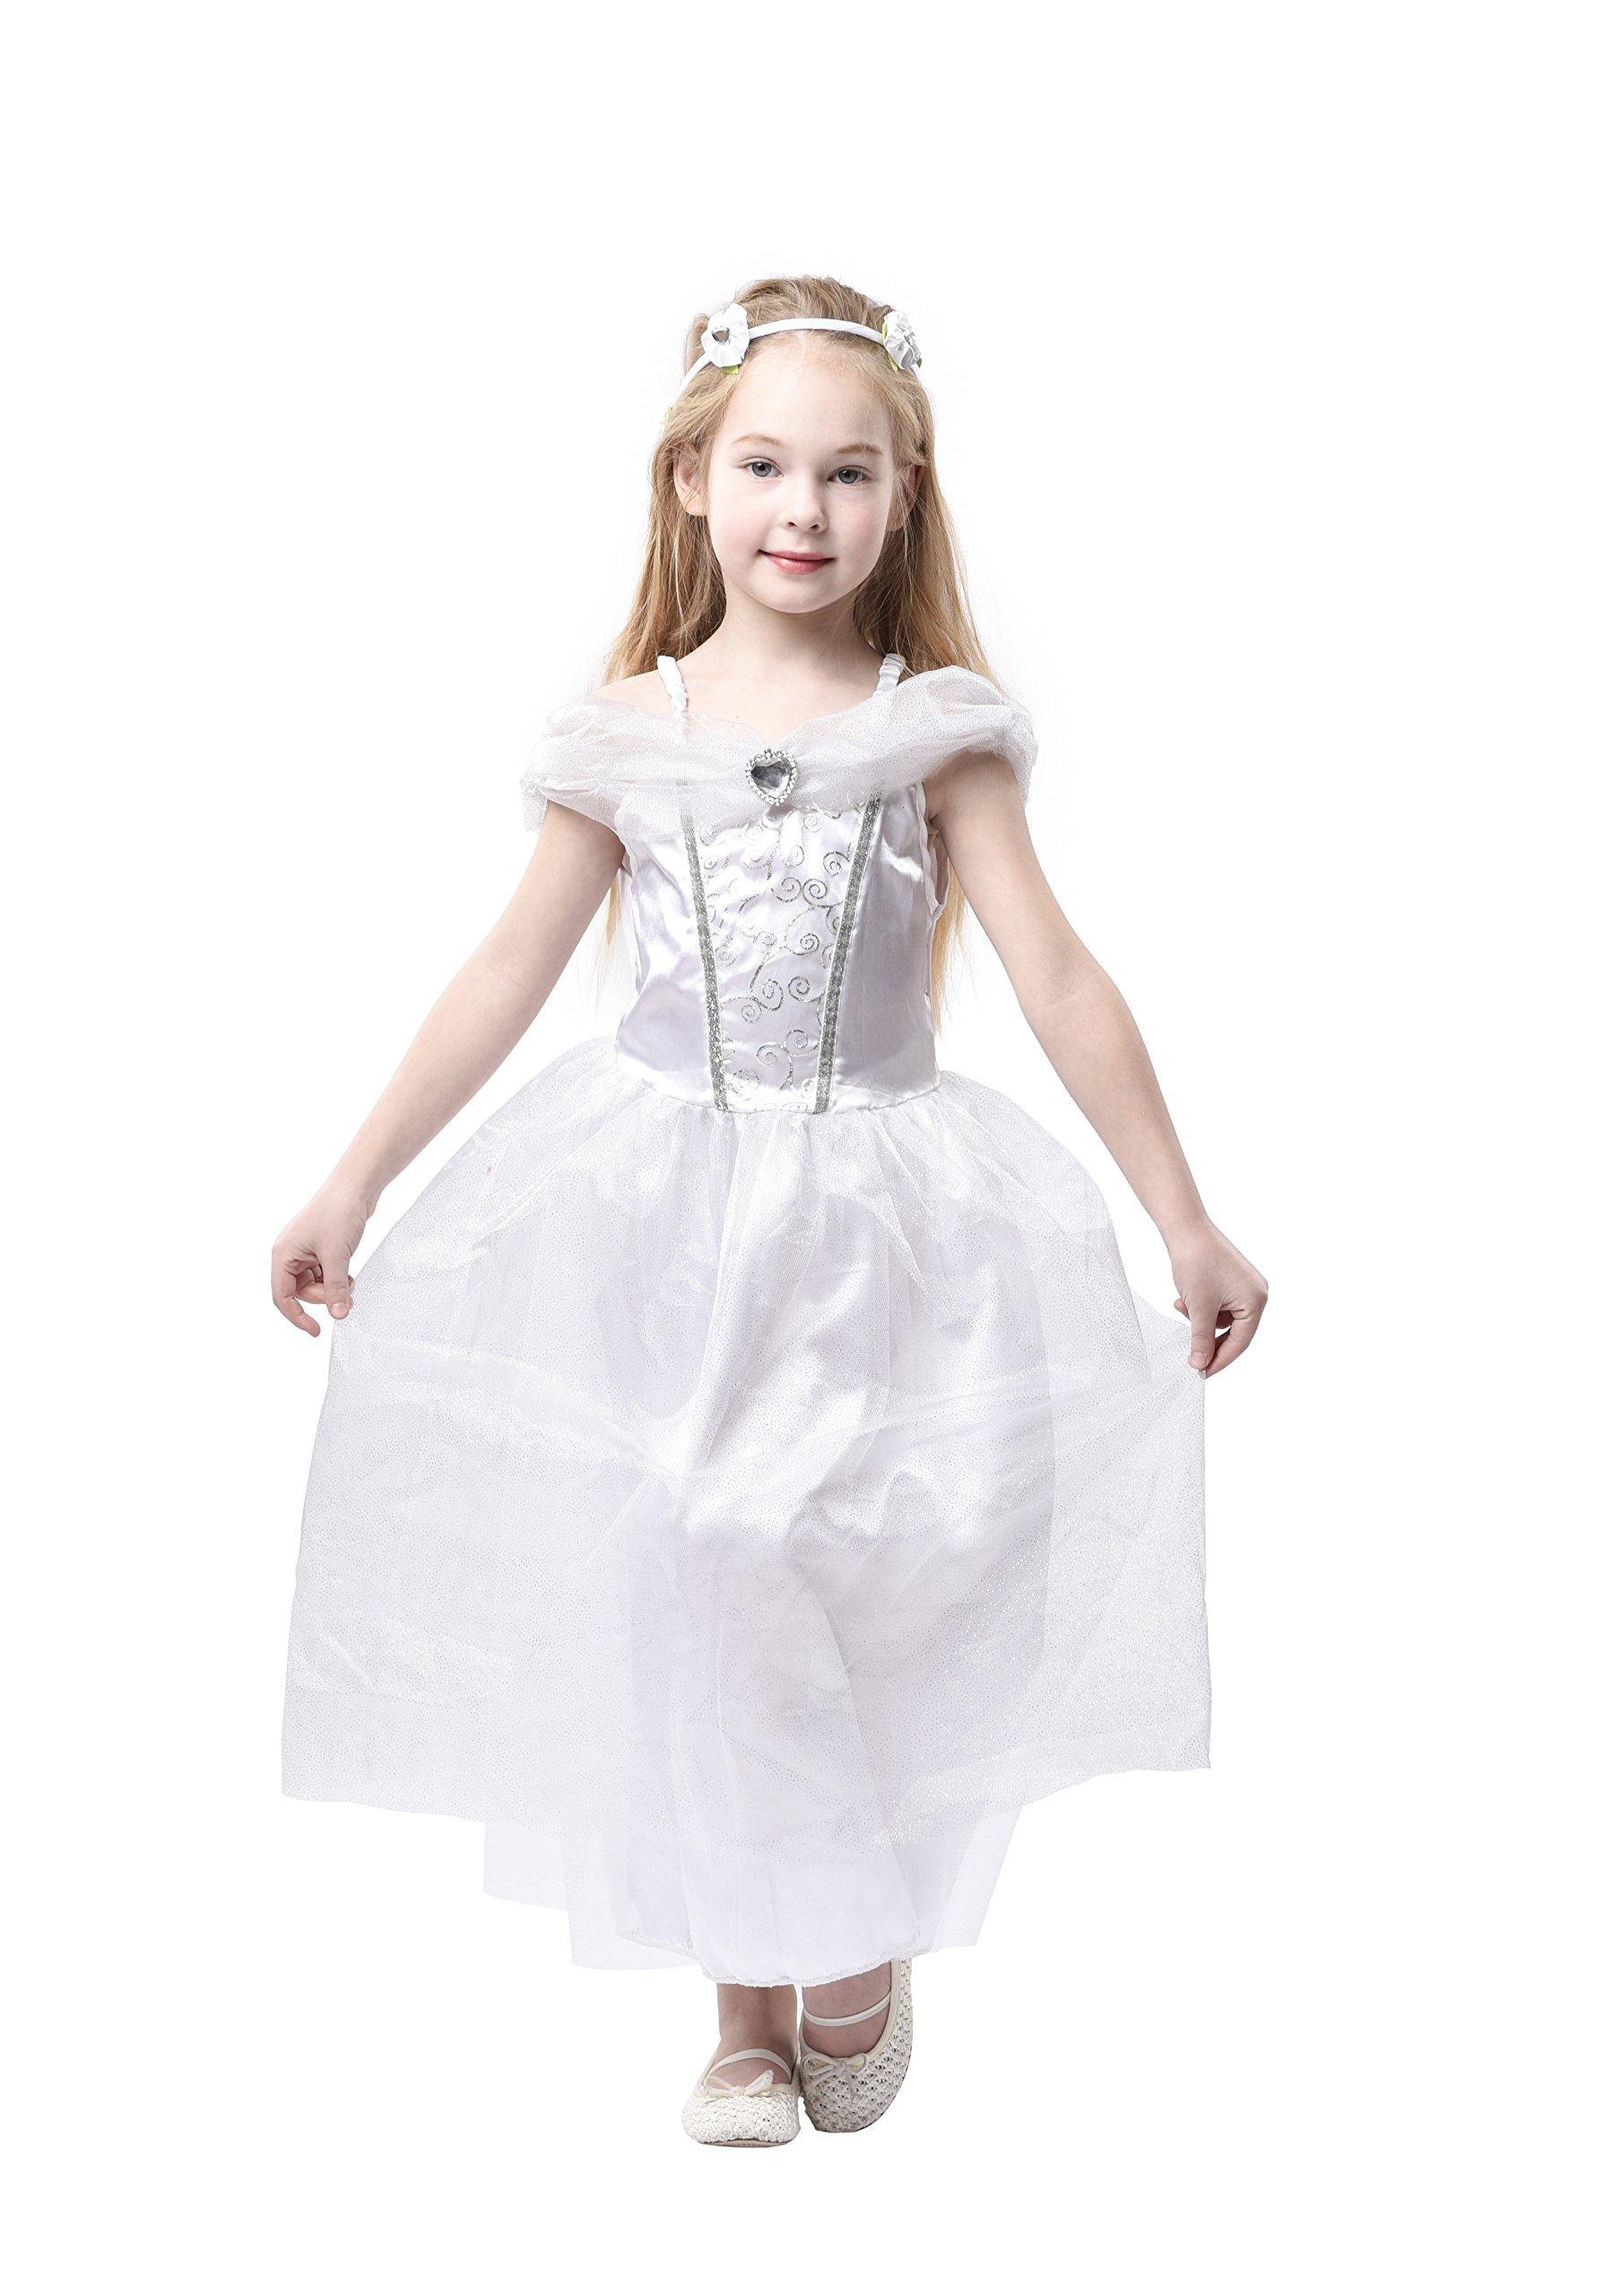 Blue Panda Wedding Dress - Kids Bride Costume, Bridal Gown Girls Dress-up, White, M